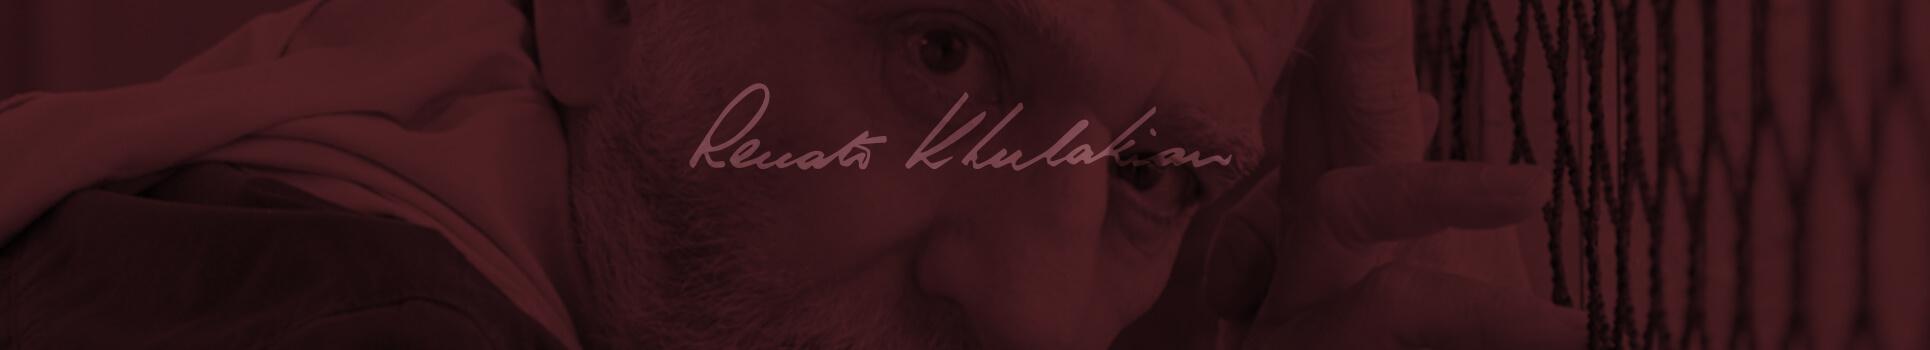 Banner de Renato Kherlakian